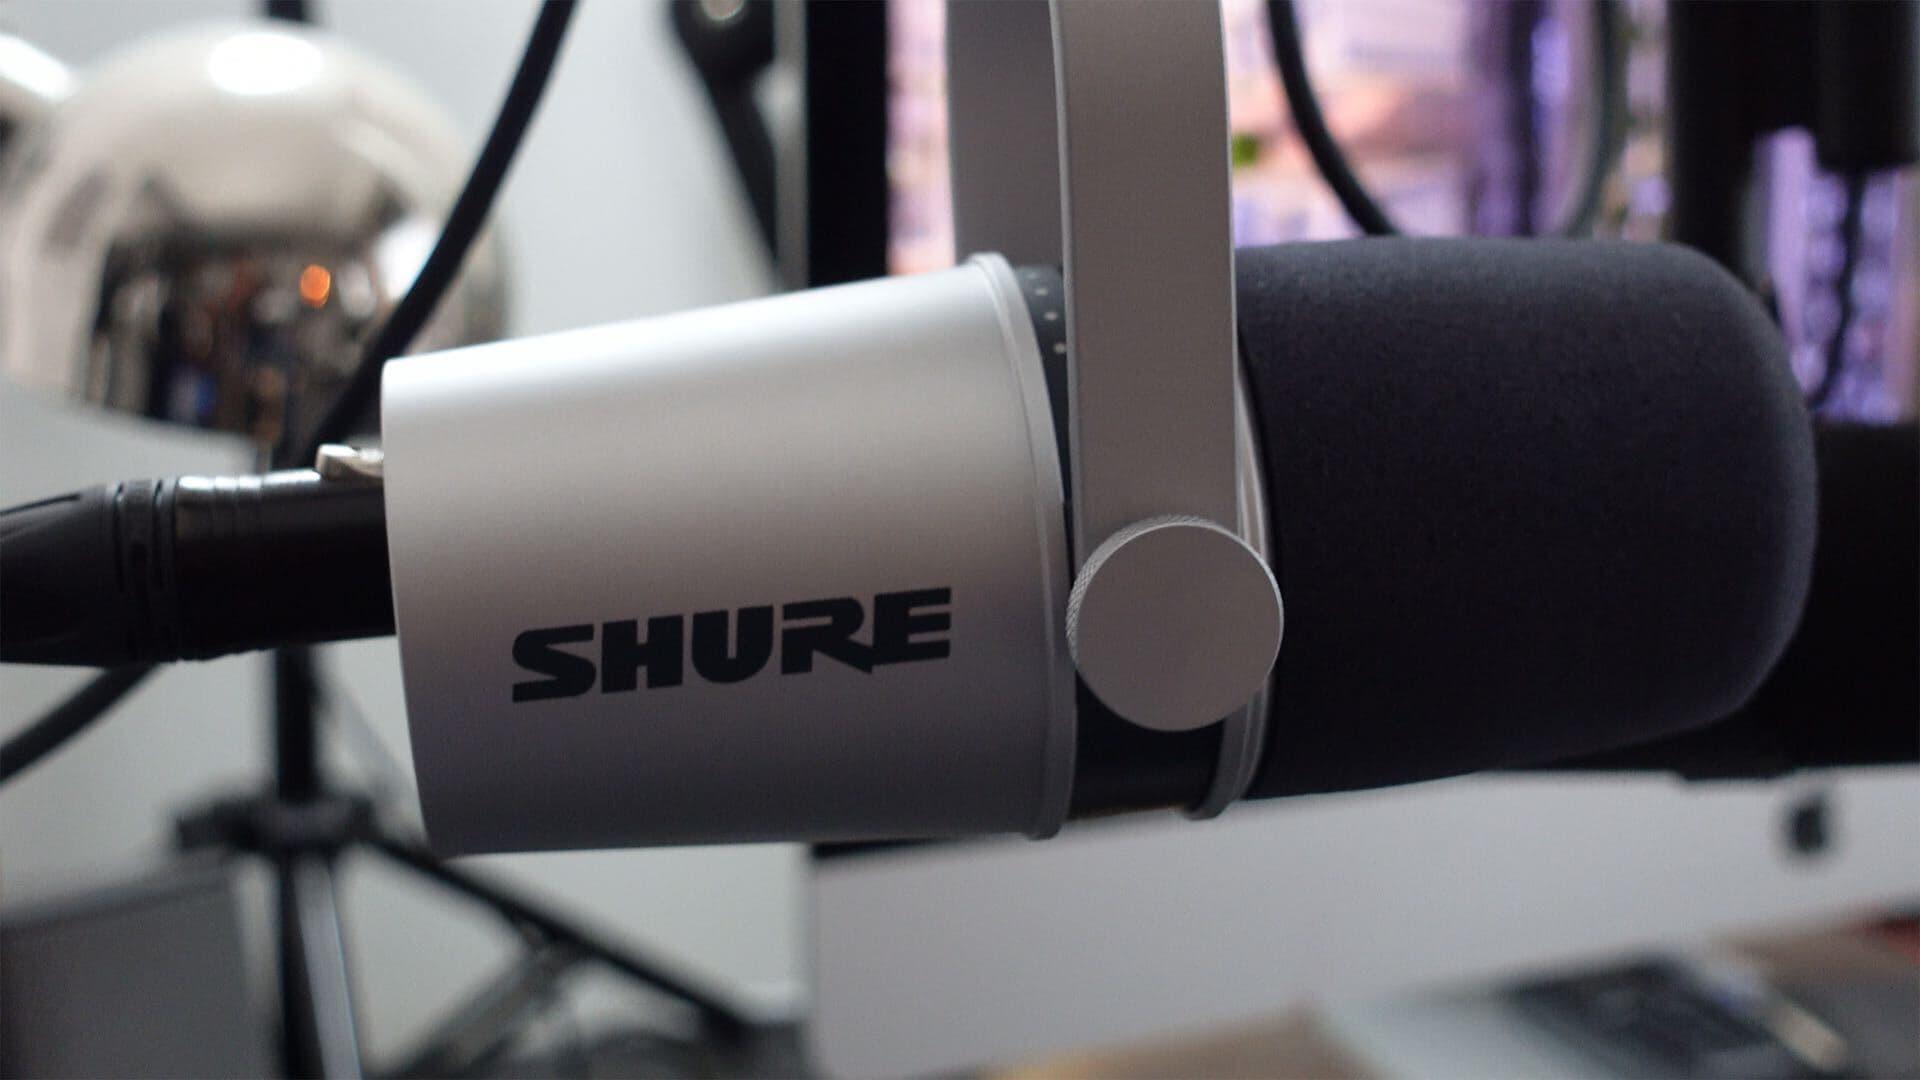 Shure MV7 XLR Use